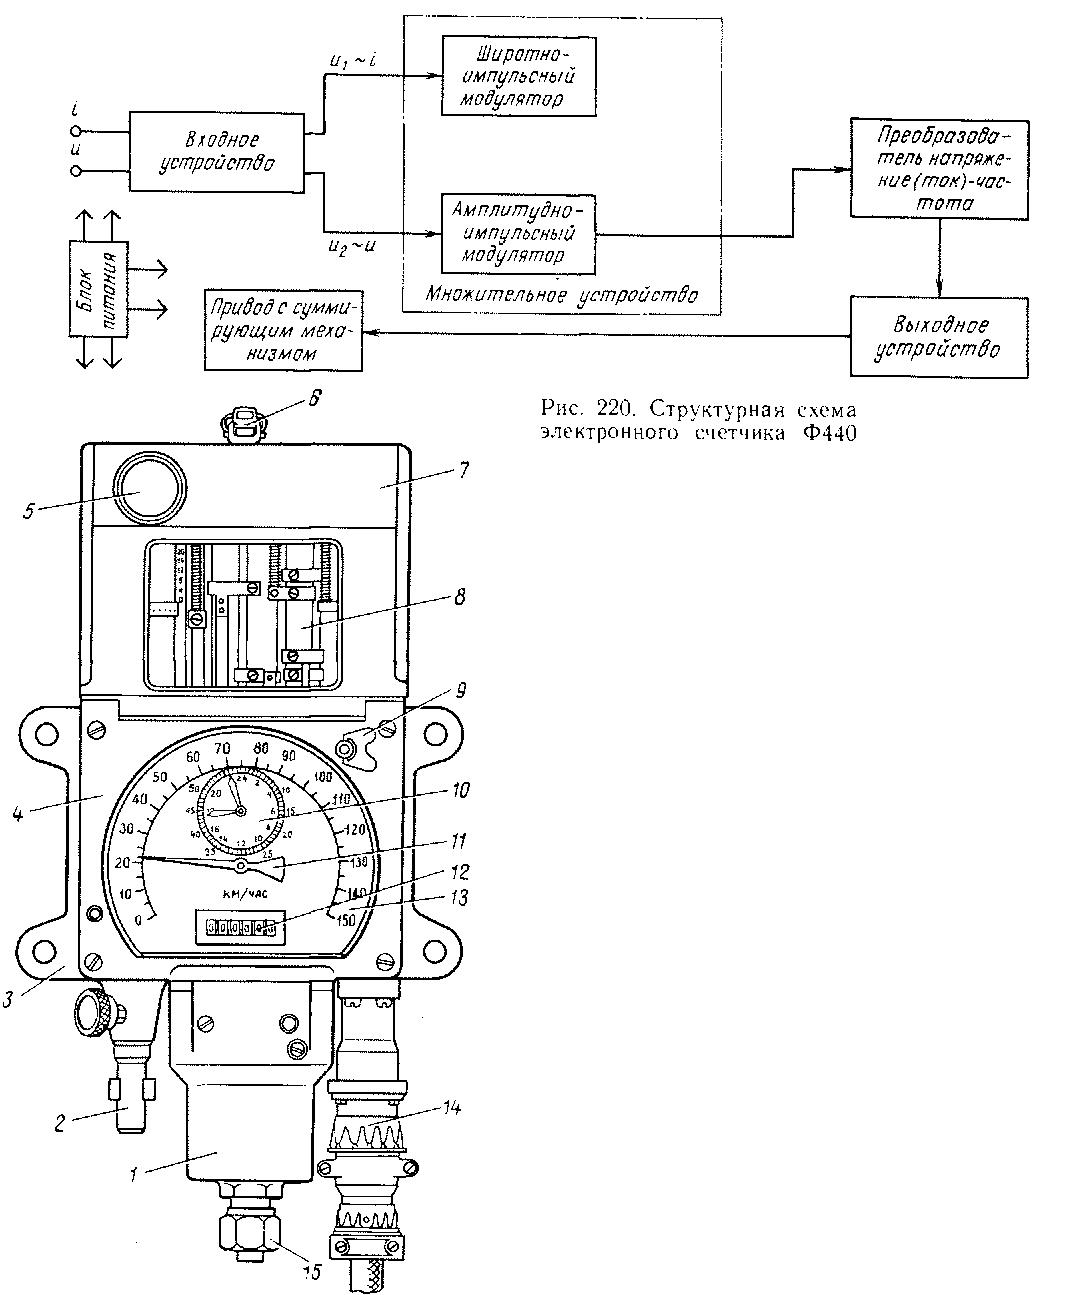 амплитудно-импульсная модуляция схема